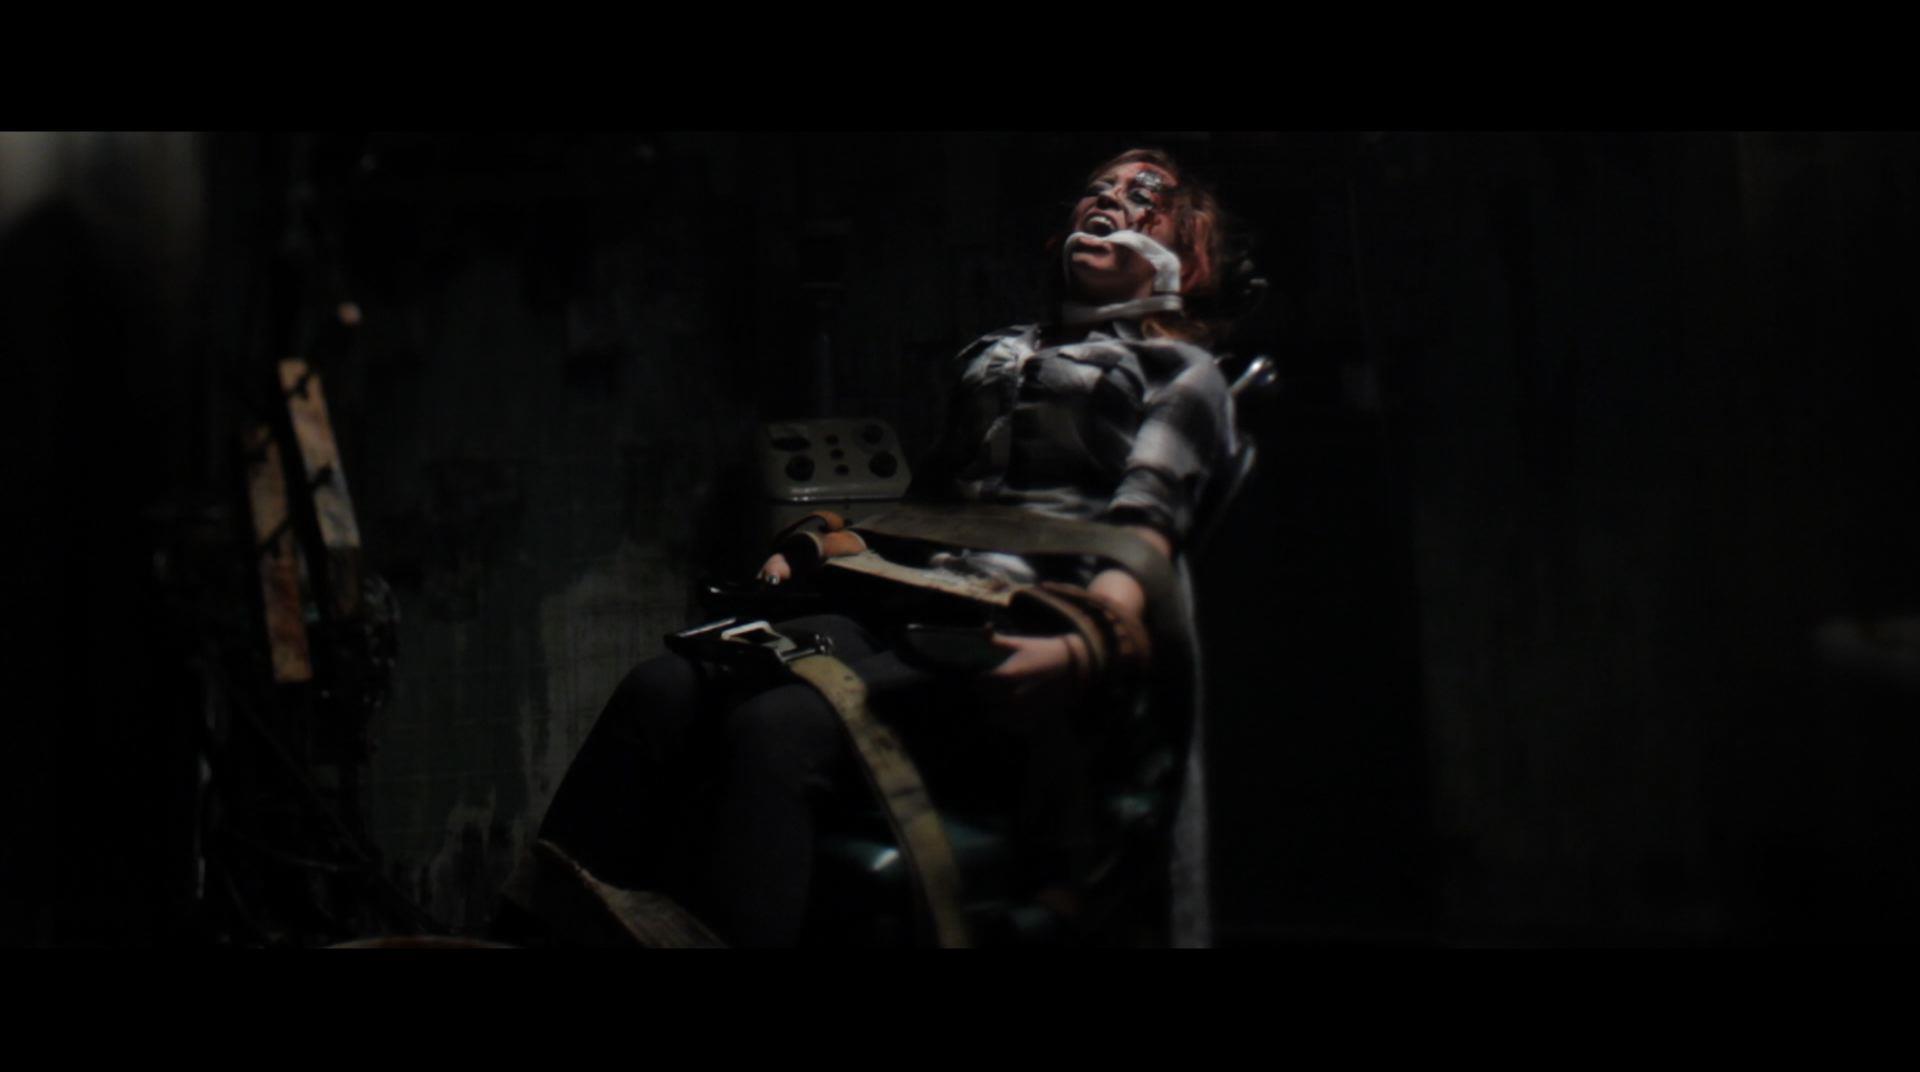 Talon-Falls-2017-torture-horror-movie-1mrhorrorpedia